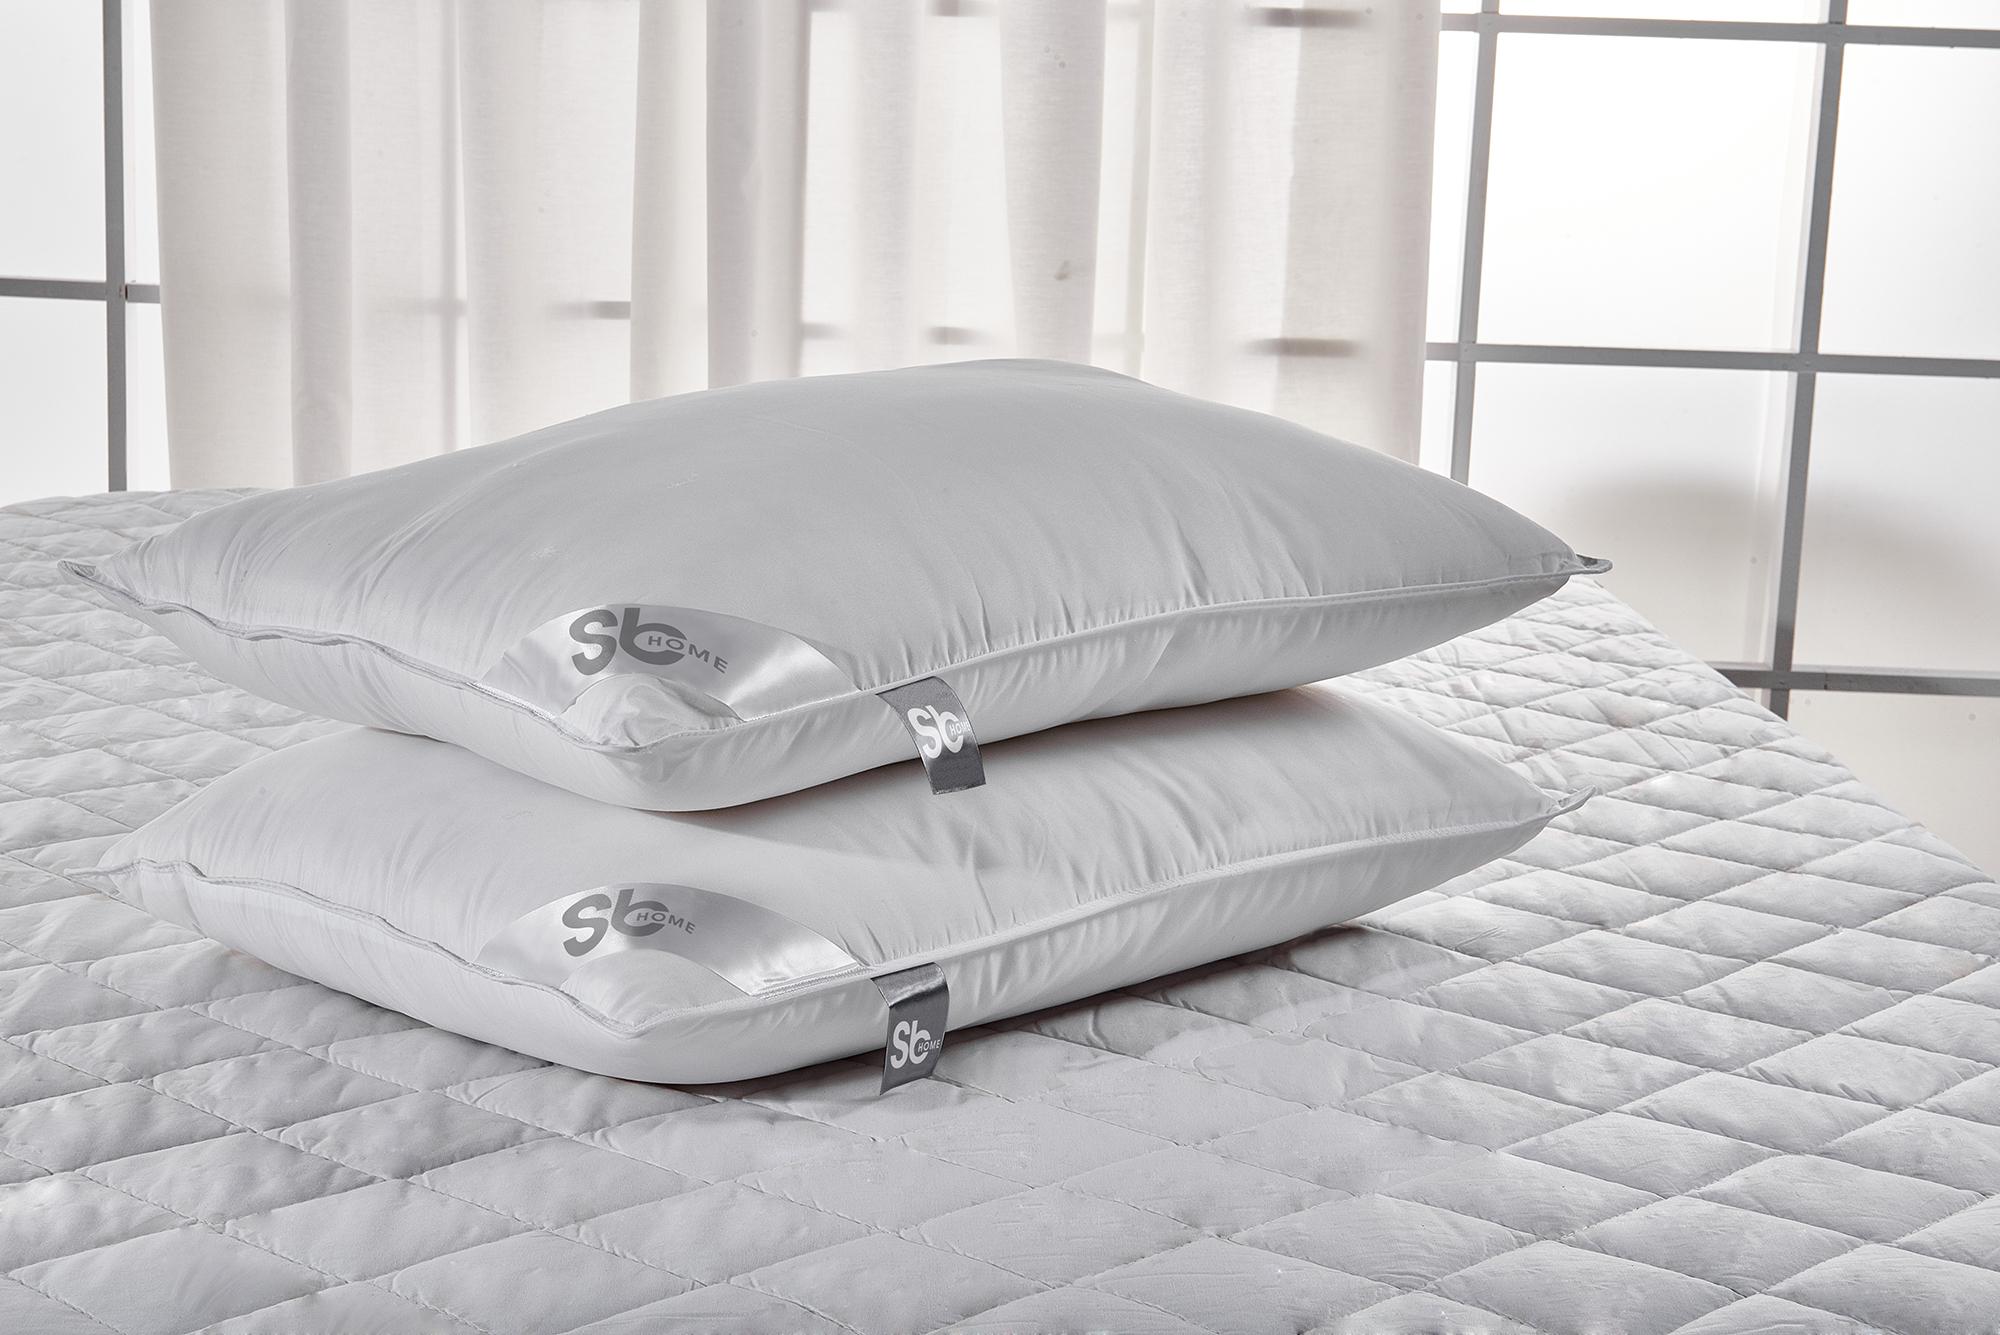 Mαξιλάρι ύπνου (50Χ70) COMFORT, SB HOME υπνοδωματιο   μαξιλάρια ύπνου   μαξιλάρια υπνου απλά